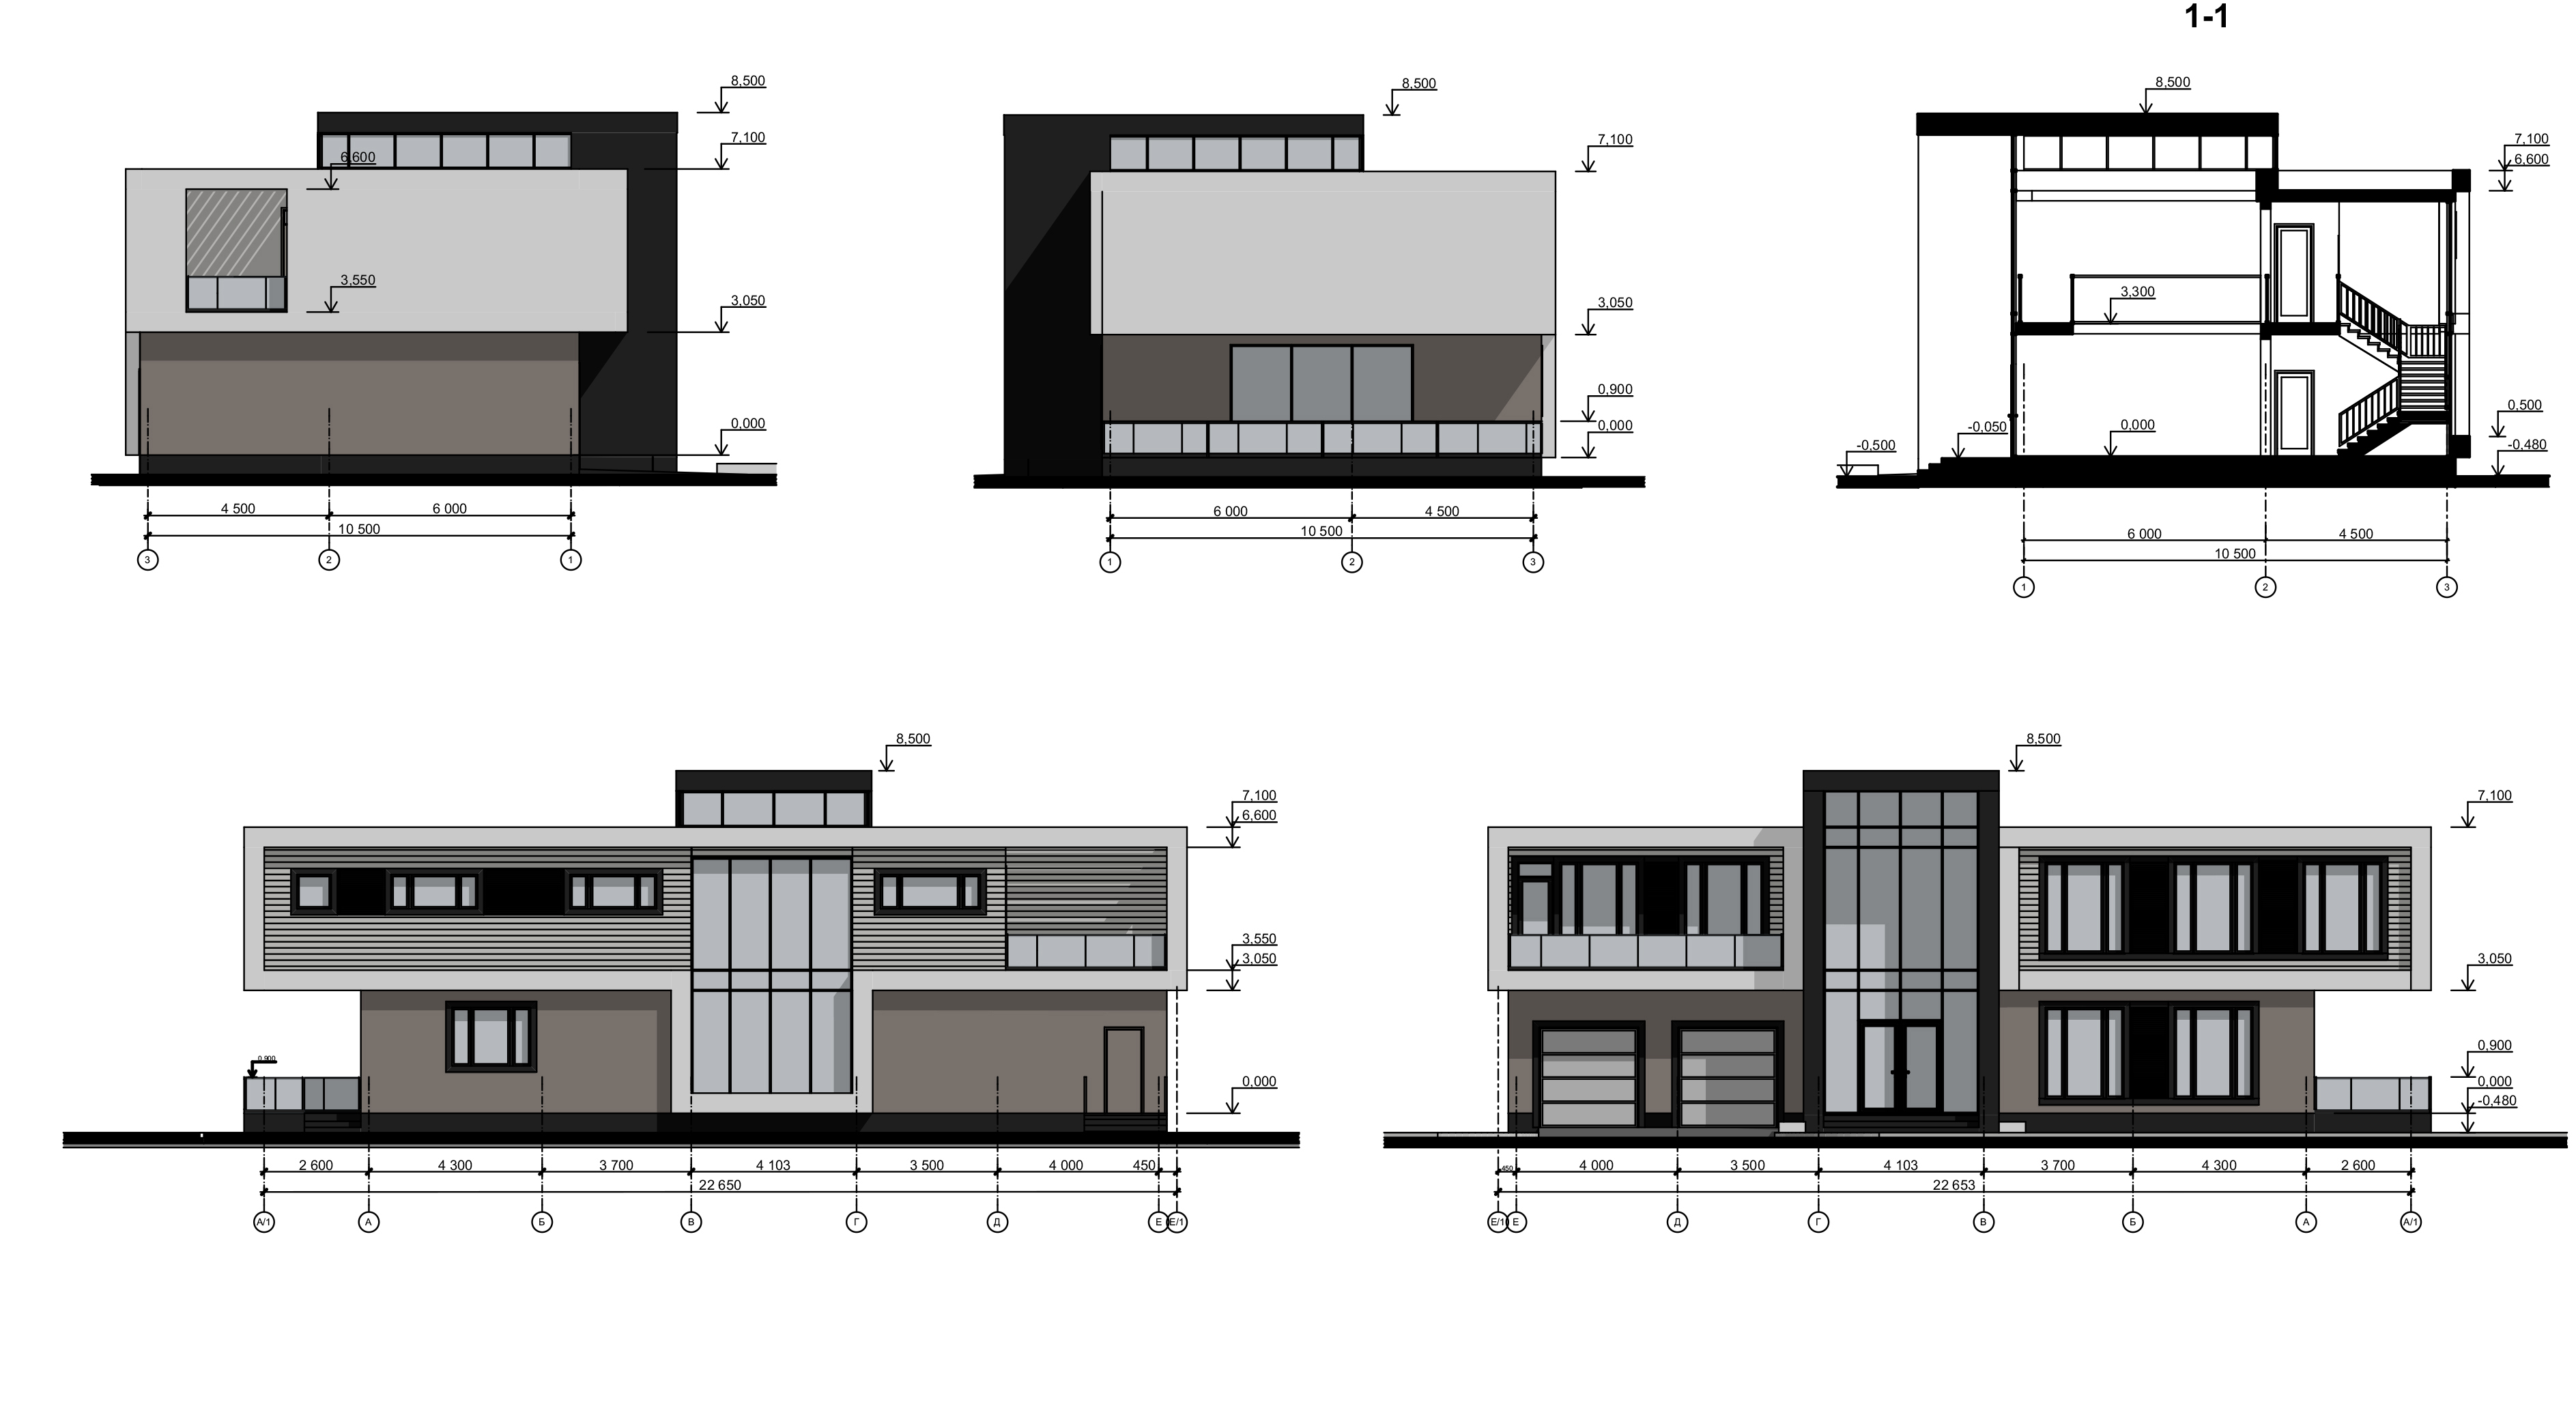 фасады и разрезы